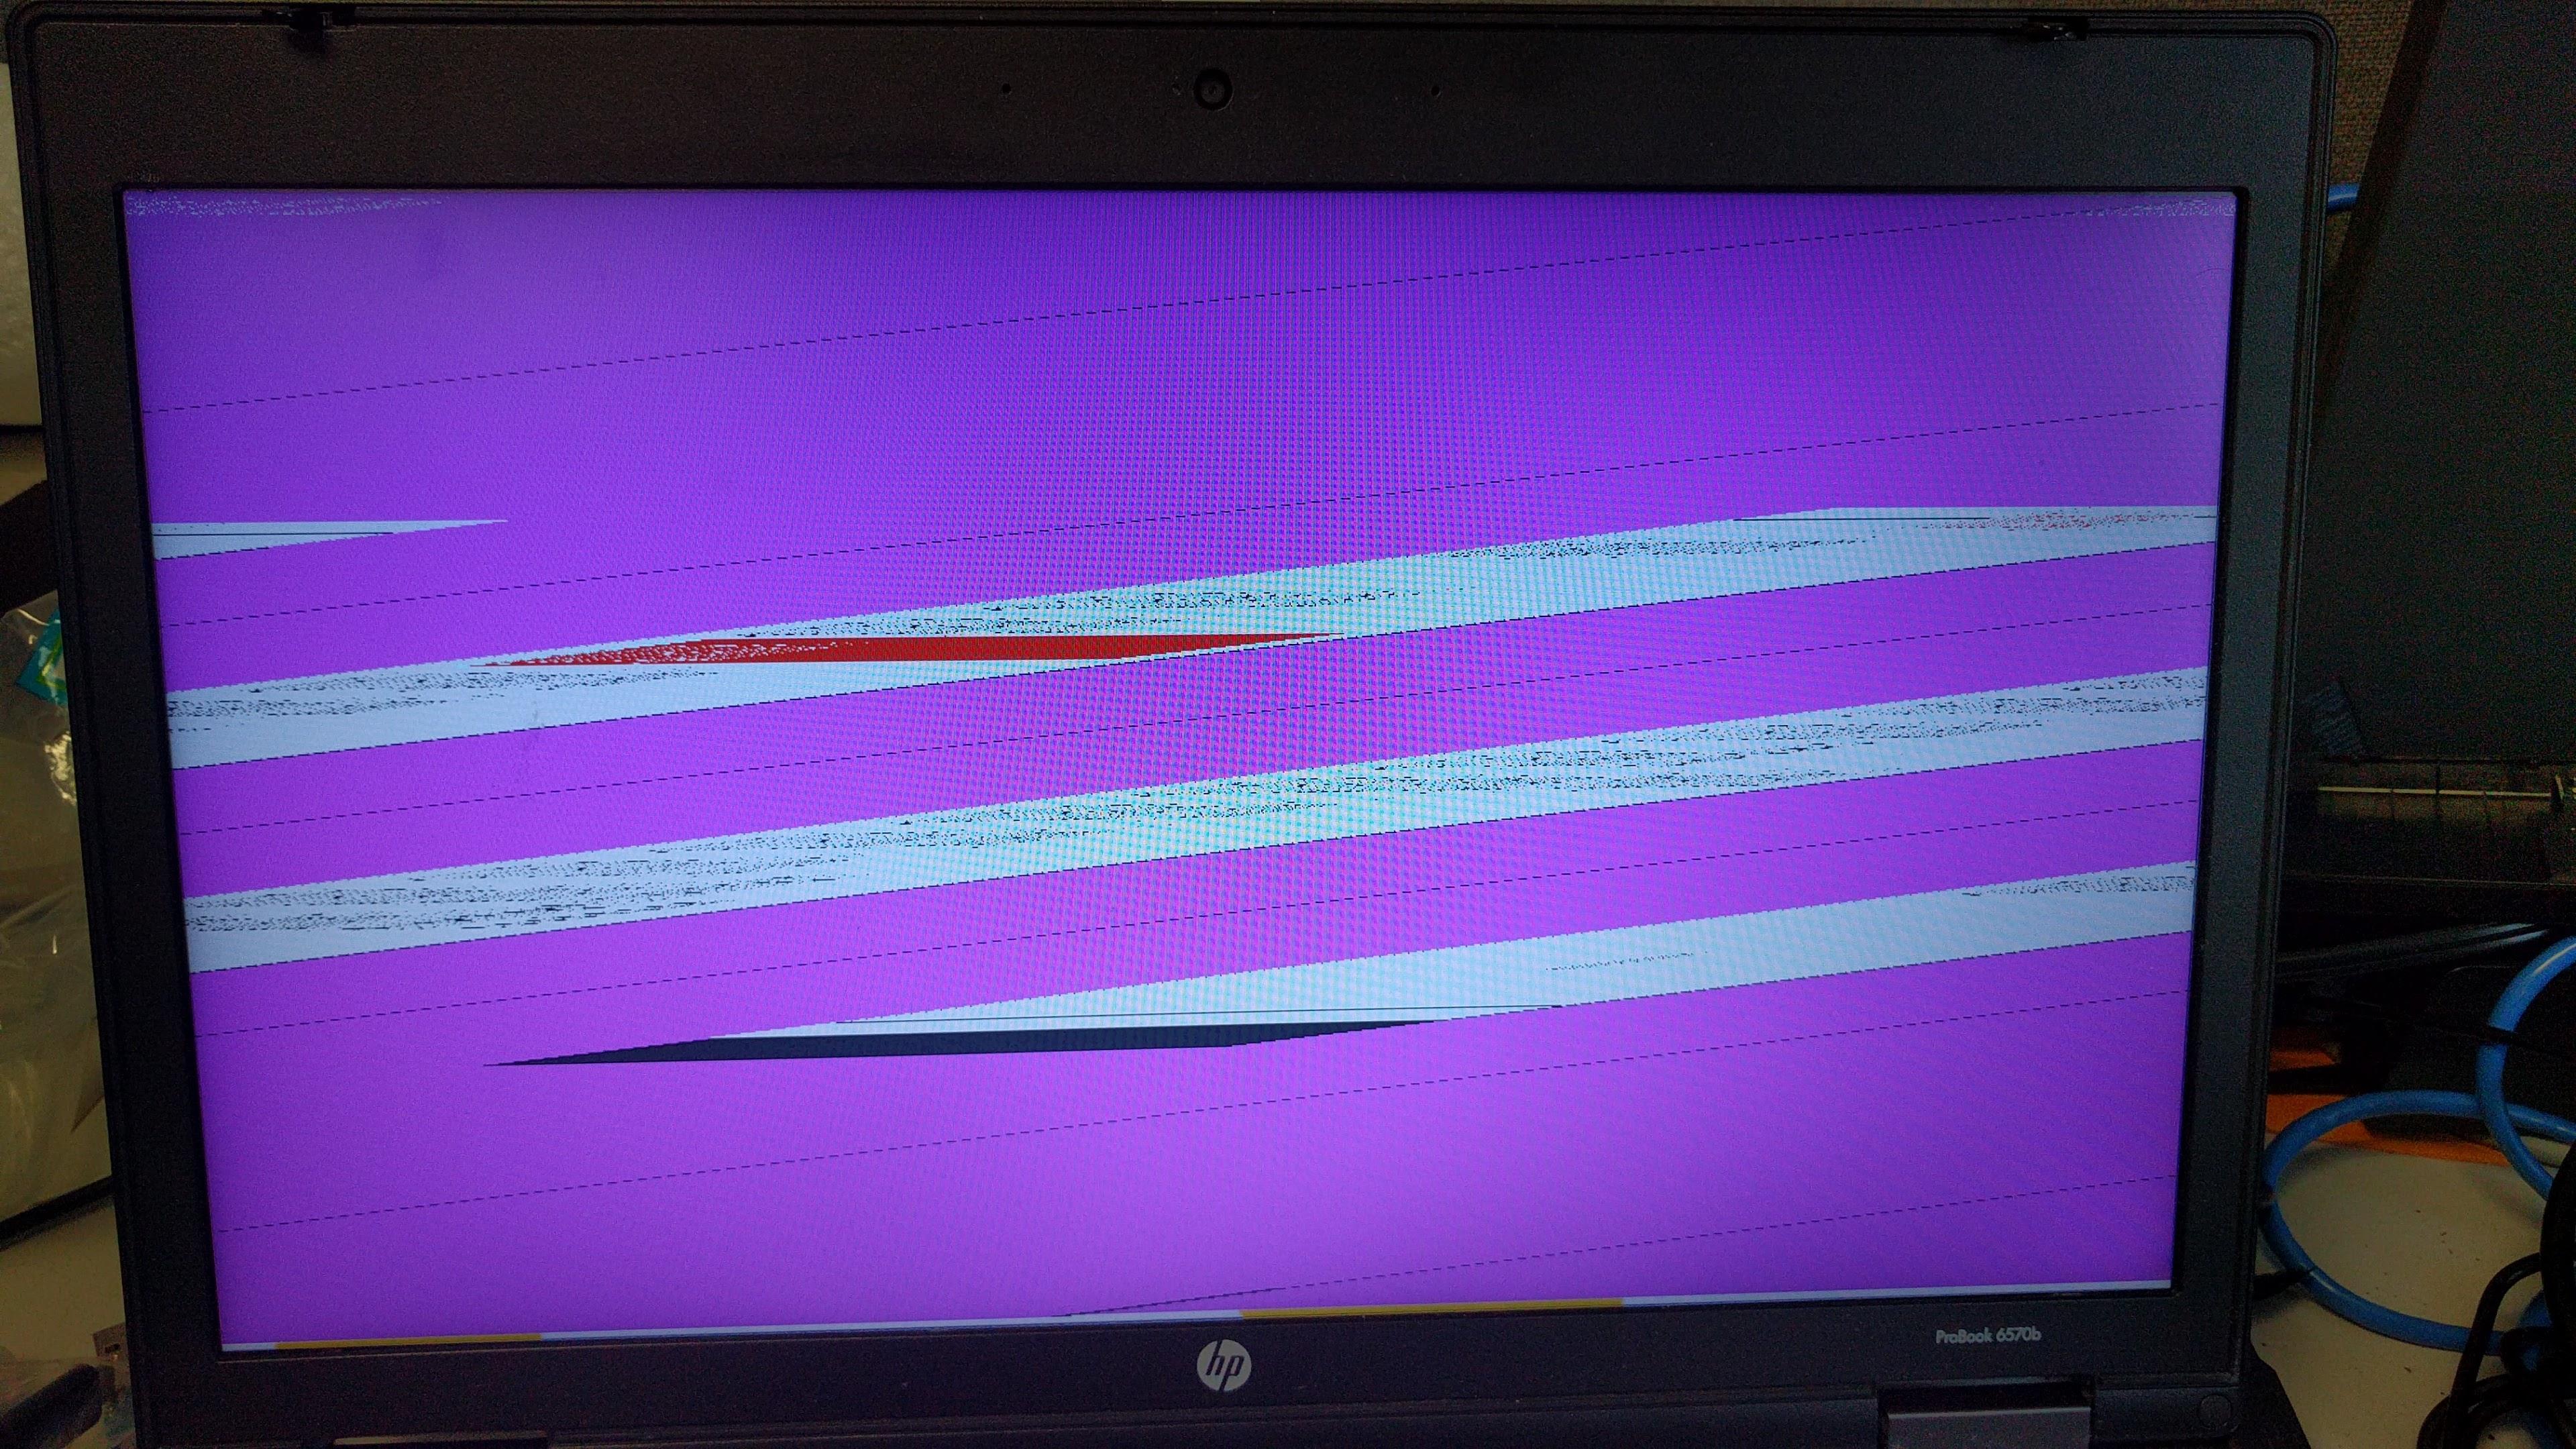 Clonezilla / Discussion / Clonezilla live:HP video problems with